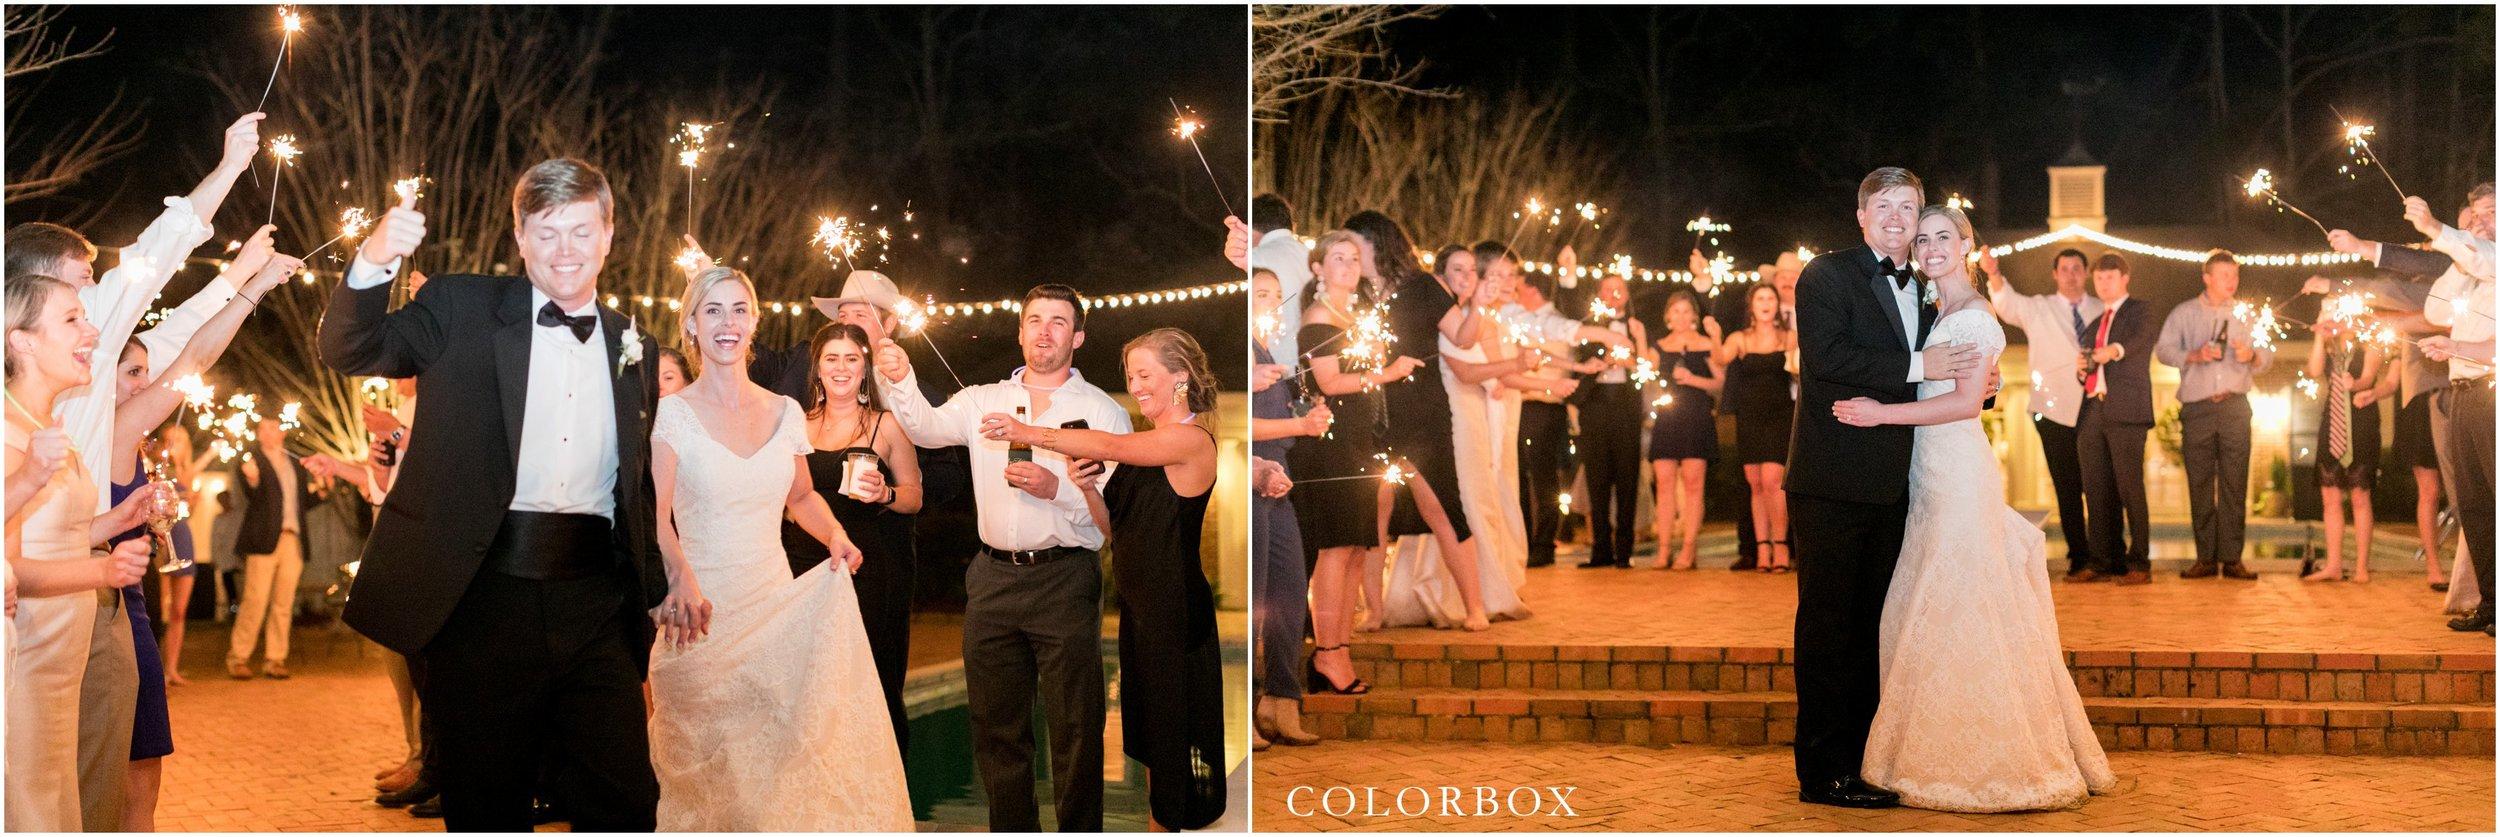 colorboxphotographers_6820.jpg